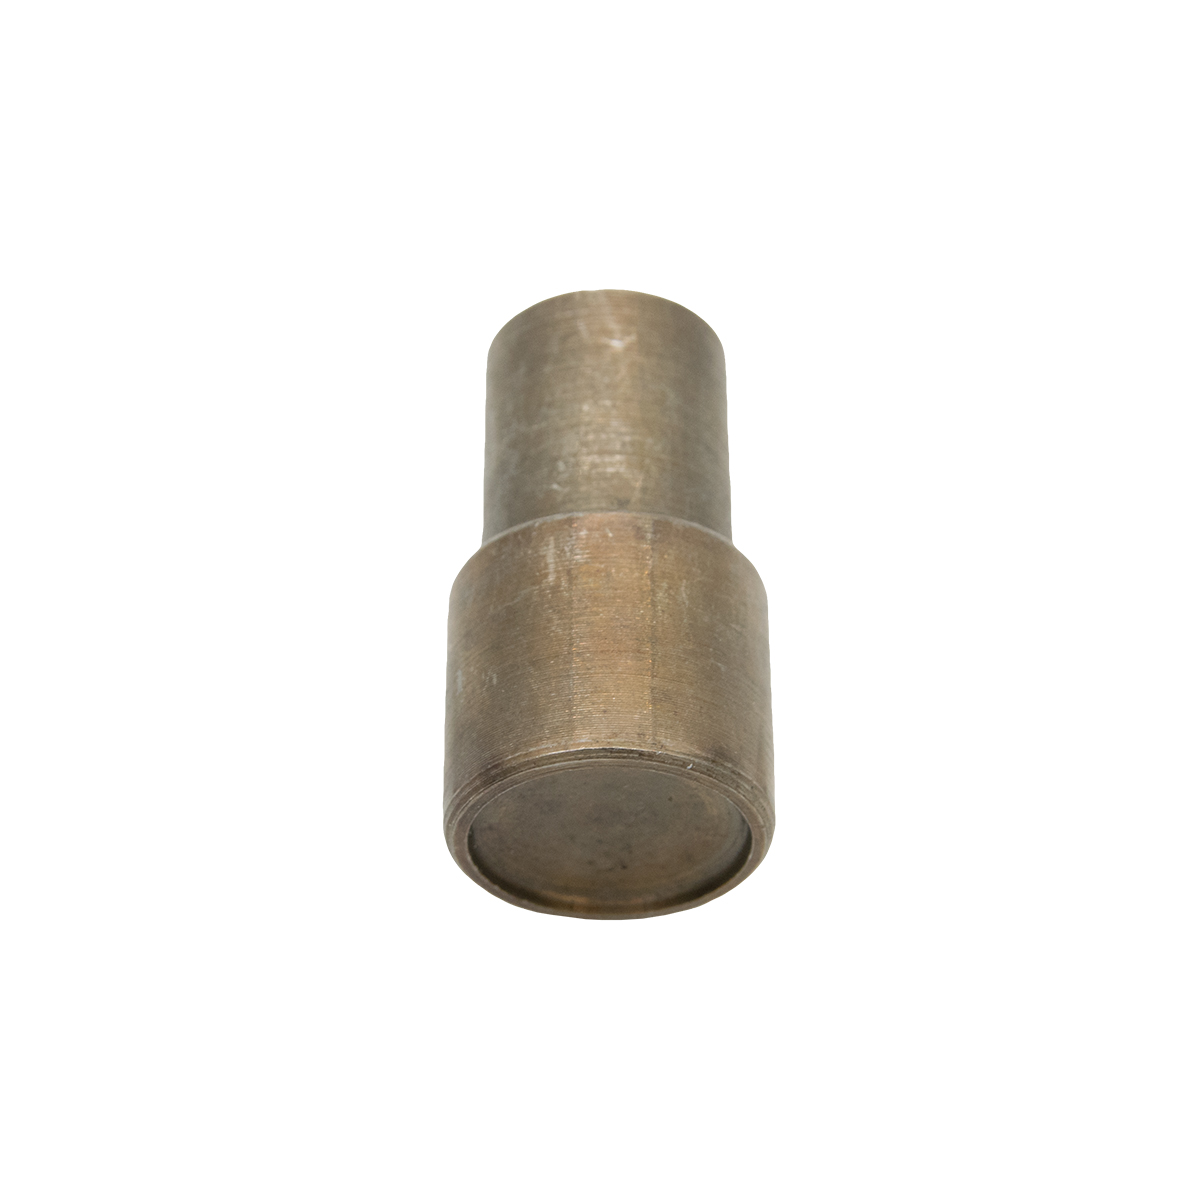 81301-90 Пуансон кнопка d-12,5 ГР